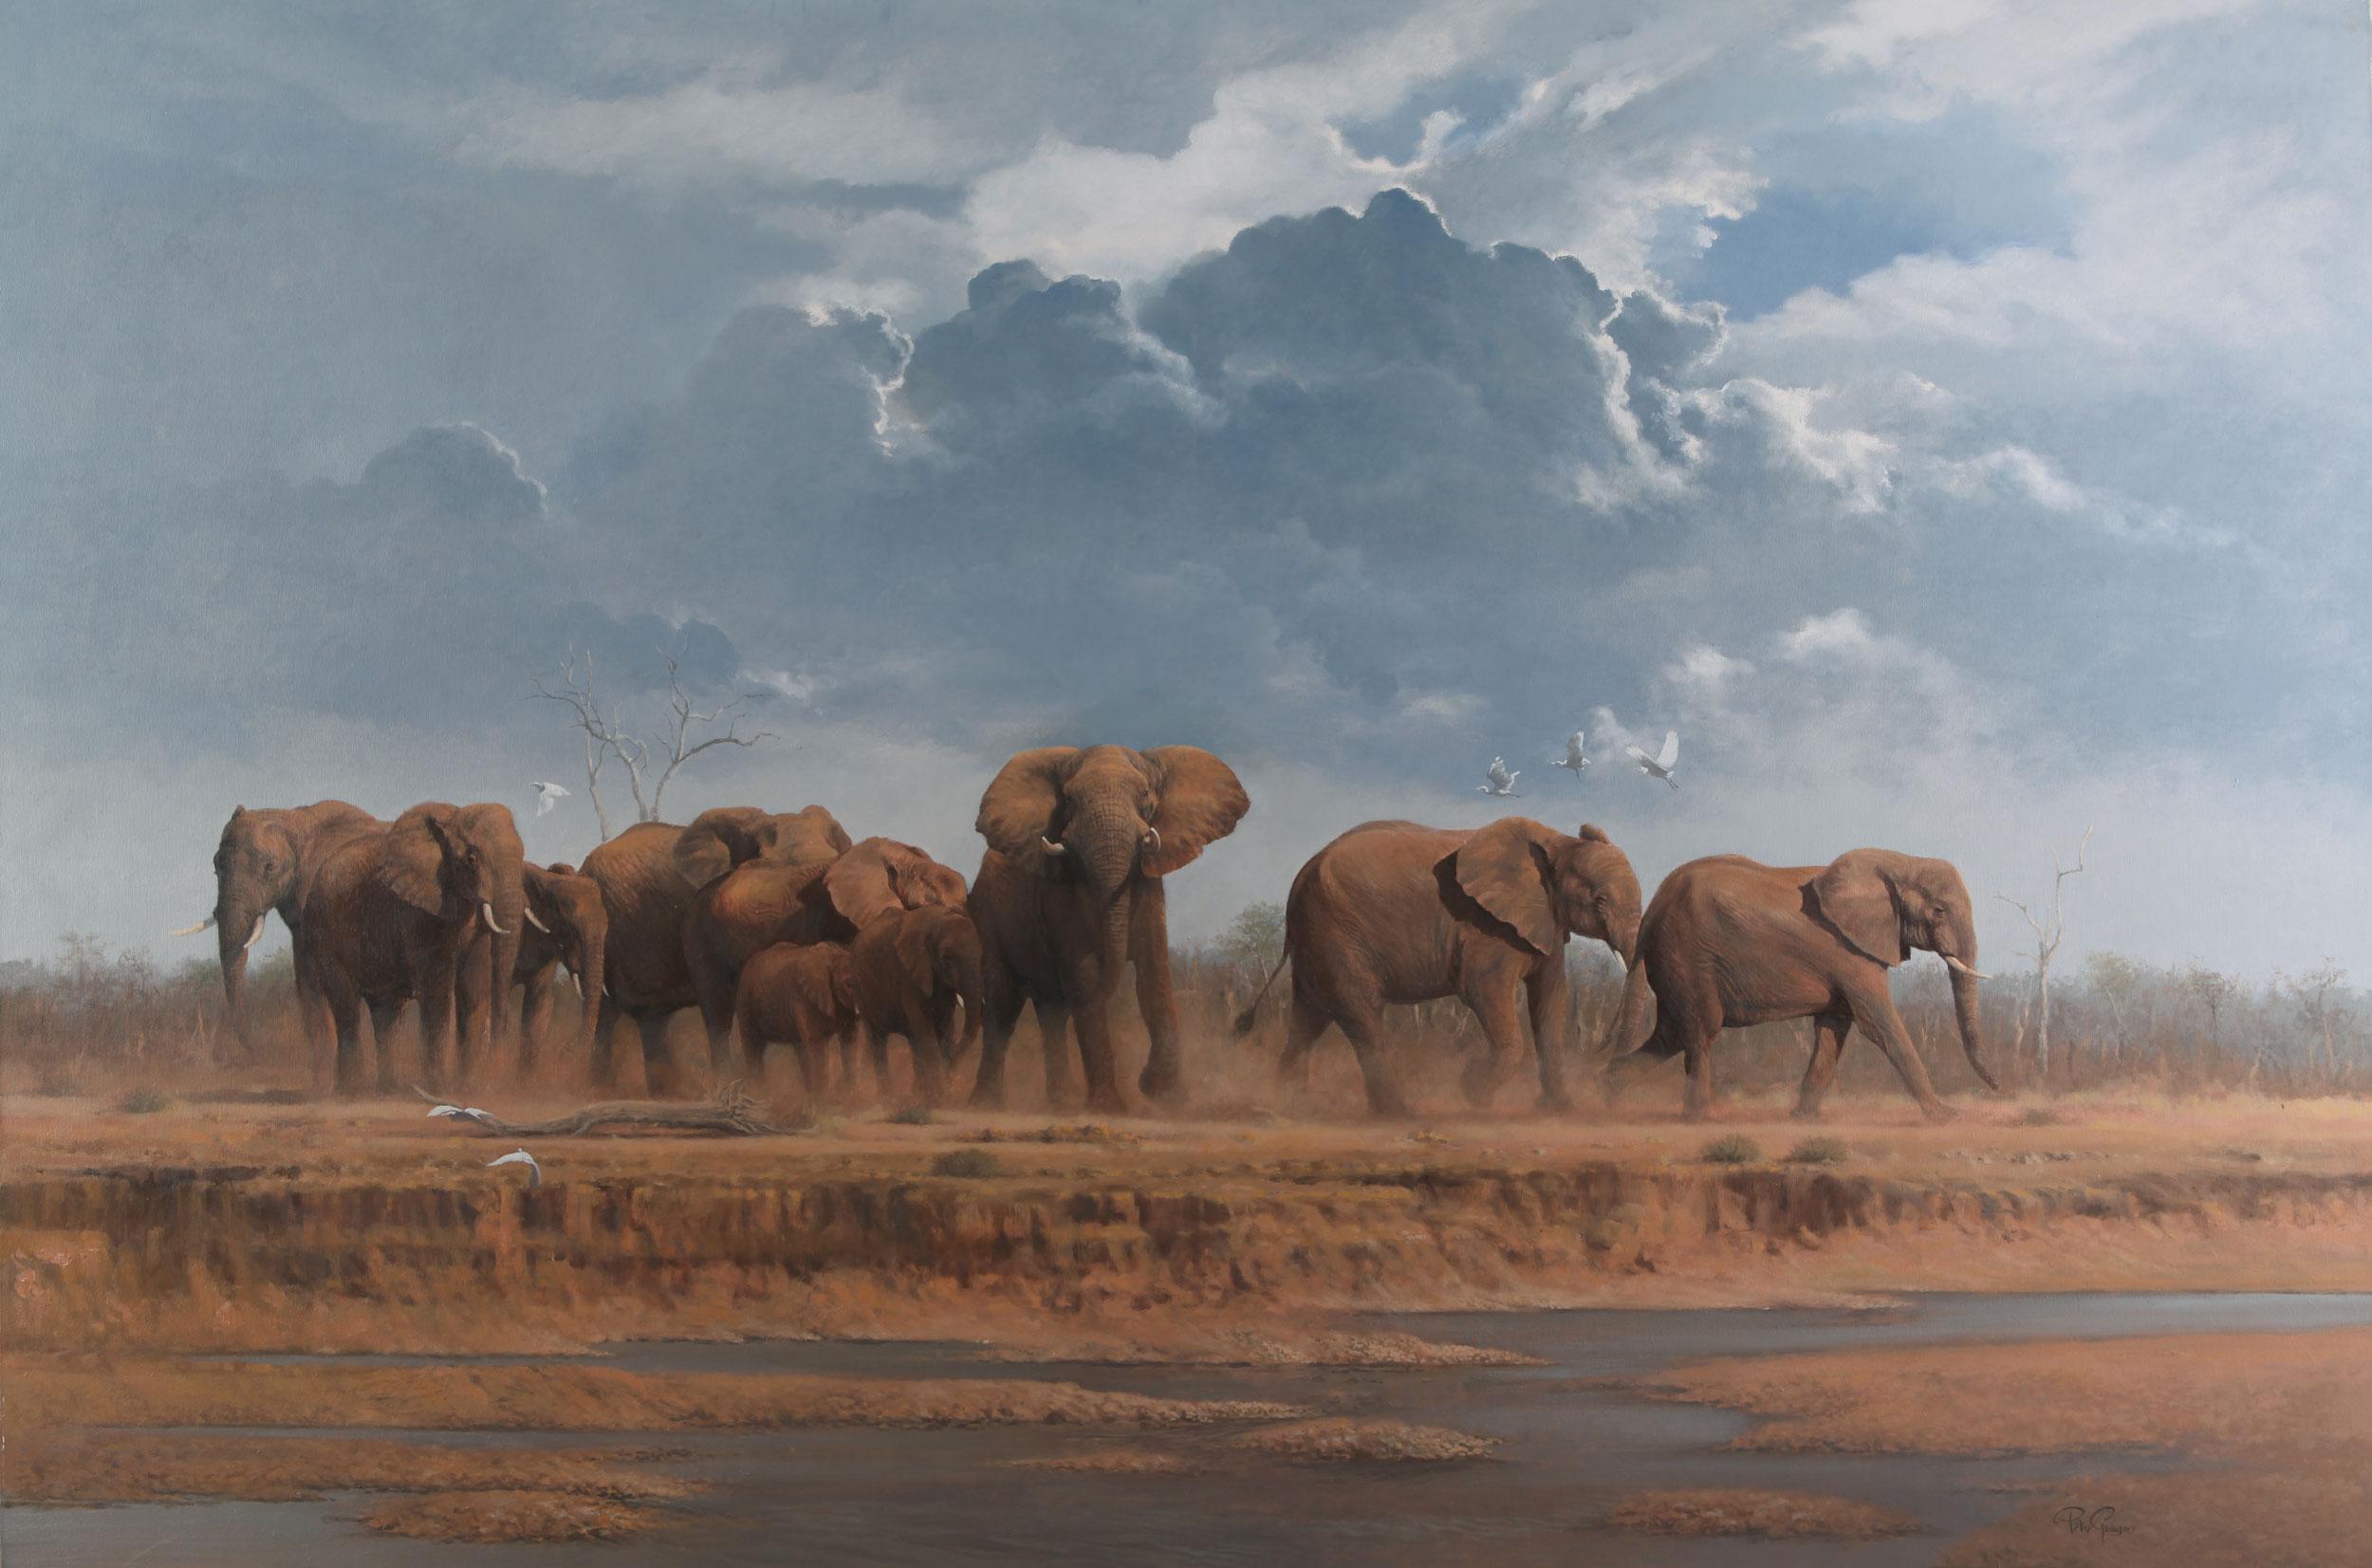 Matriarchal-Herd.jpg